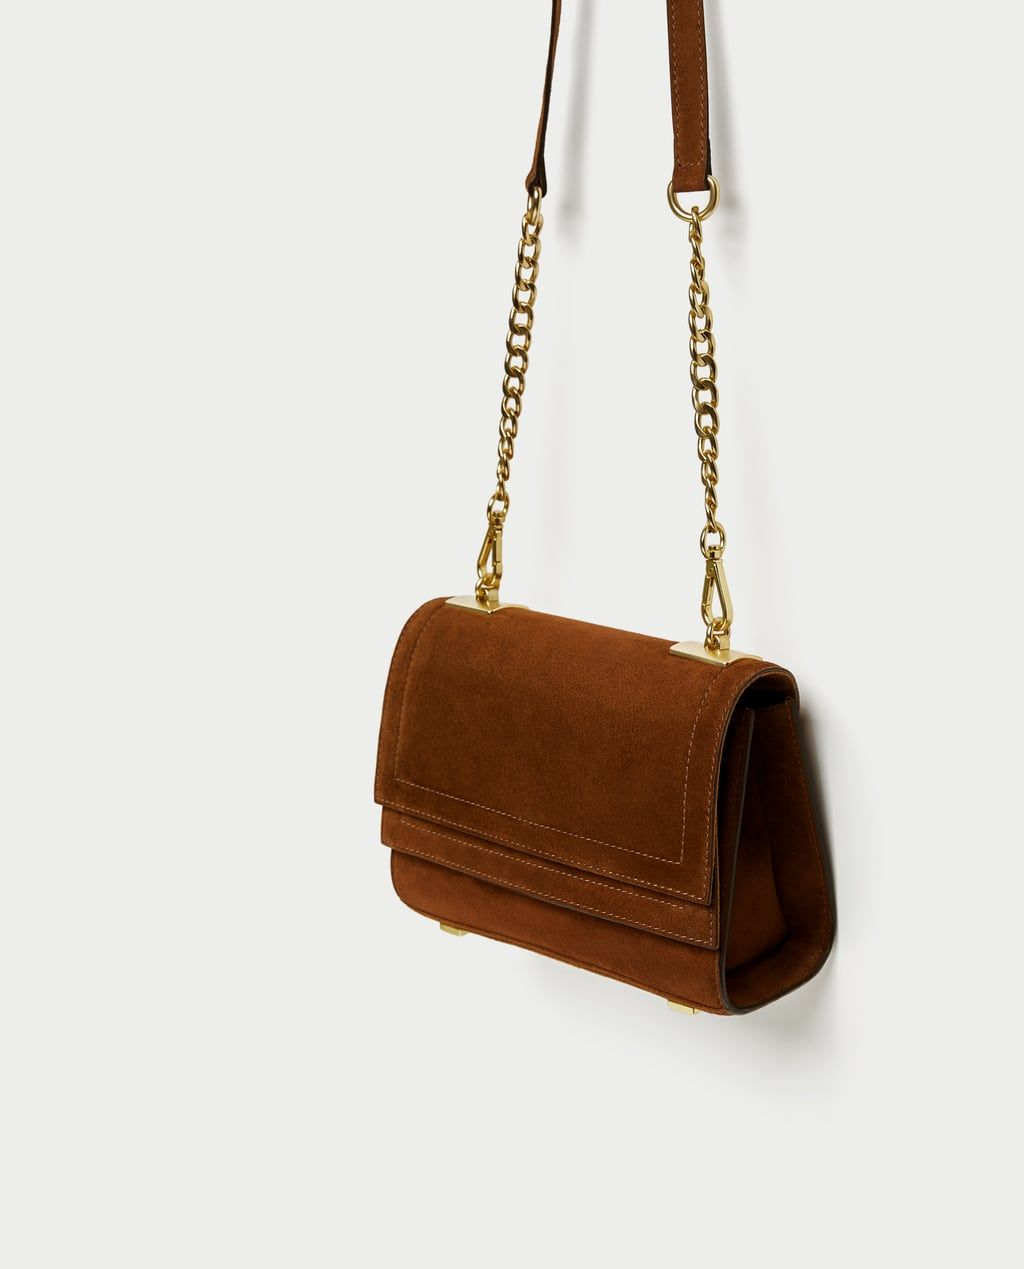 9044b268d4b Image 4 of LEATHER CROSSBODY BAG from Zara | Wishlist in 2019 ...